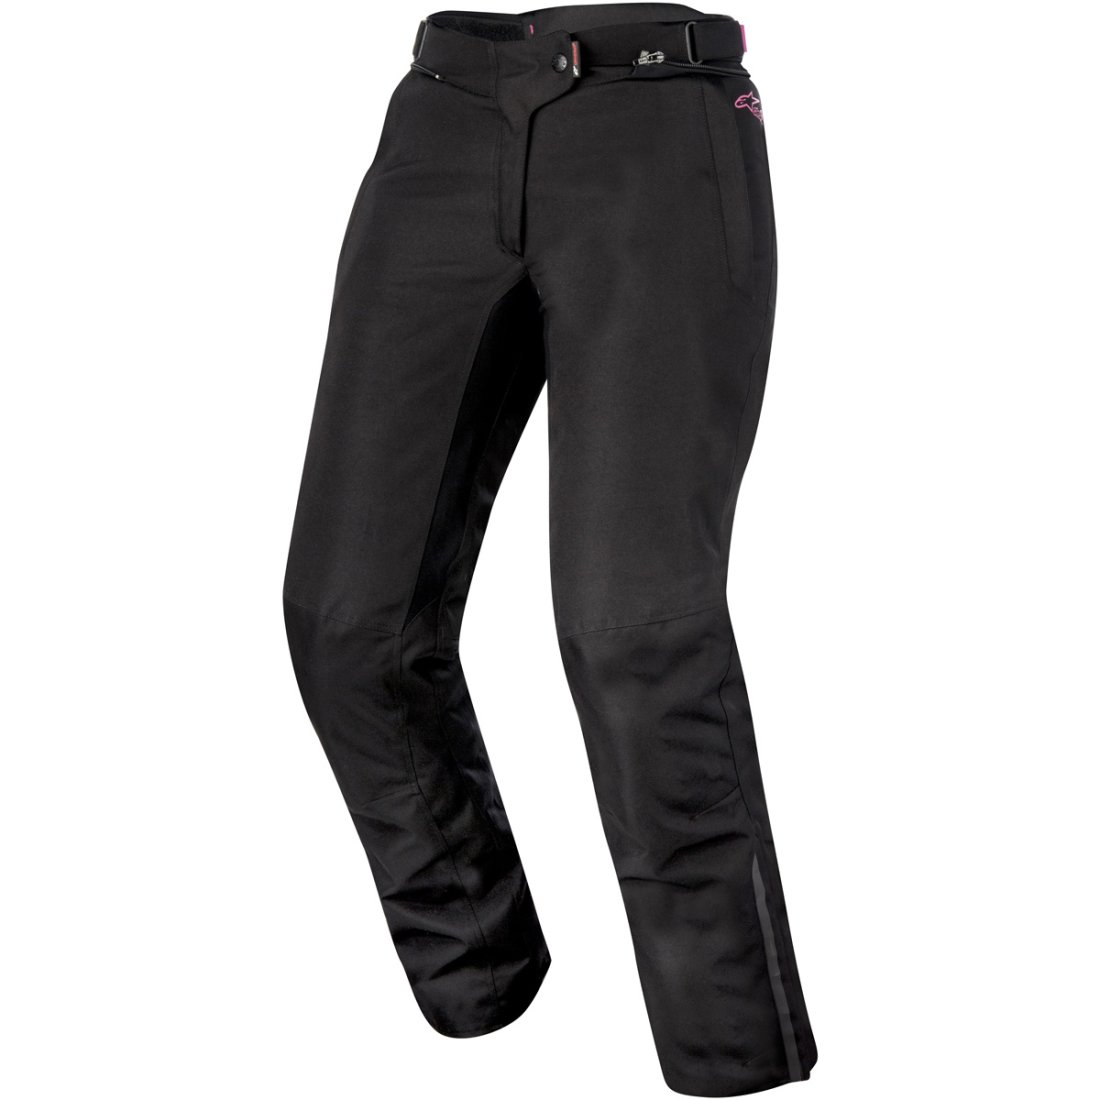 Carretera De 93 Para · Motocard Mujer Pantalones Moto gb76fIvyYm